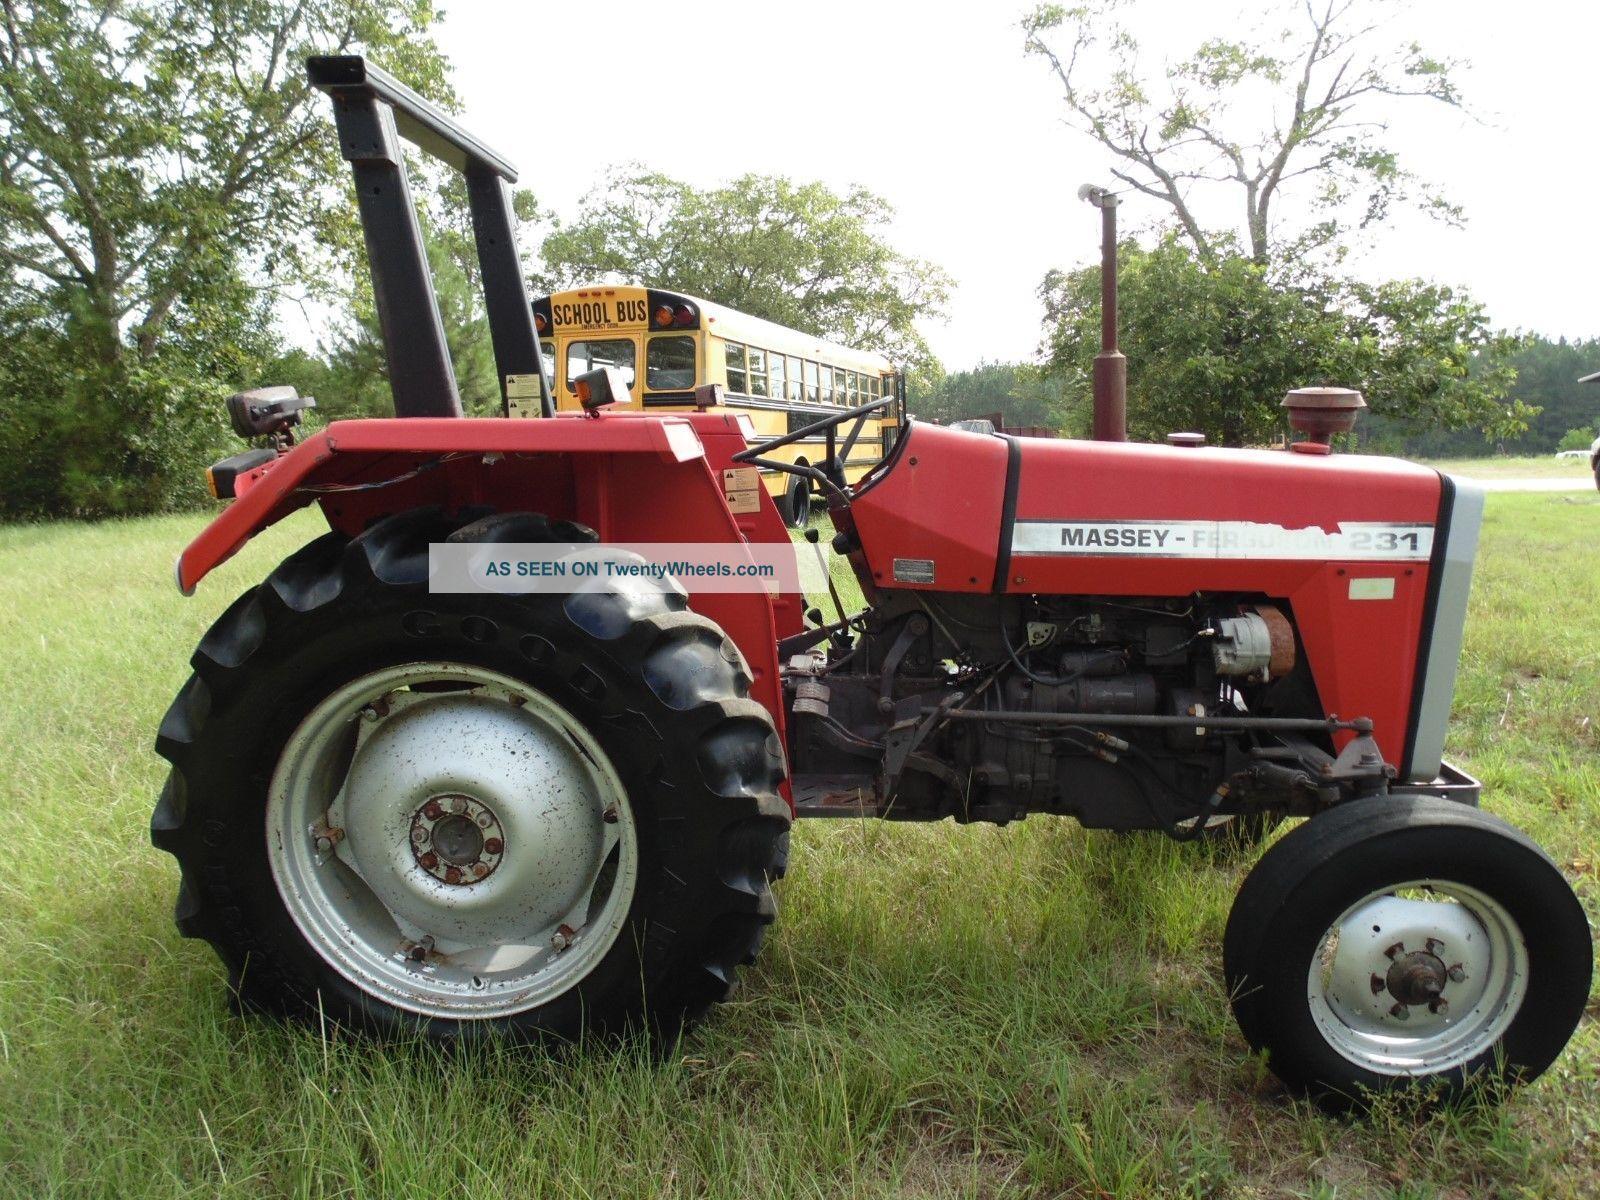 Massey Ferguson 231 Tractor : Massey ferguson farm tractor horsepower diesel in